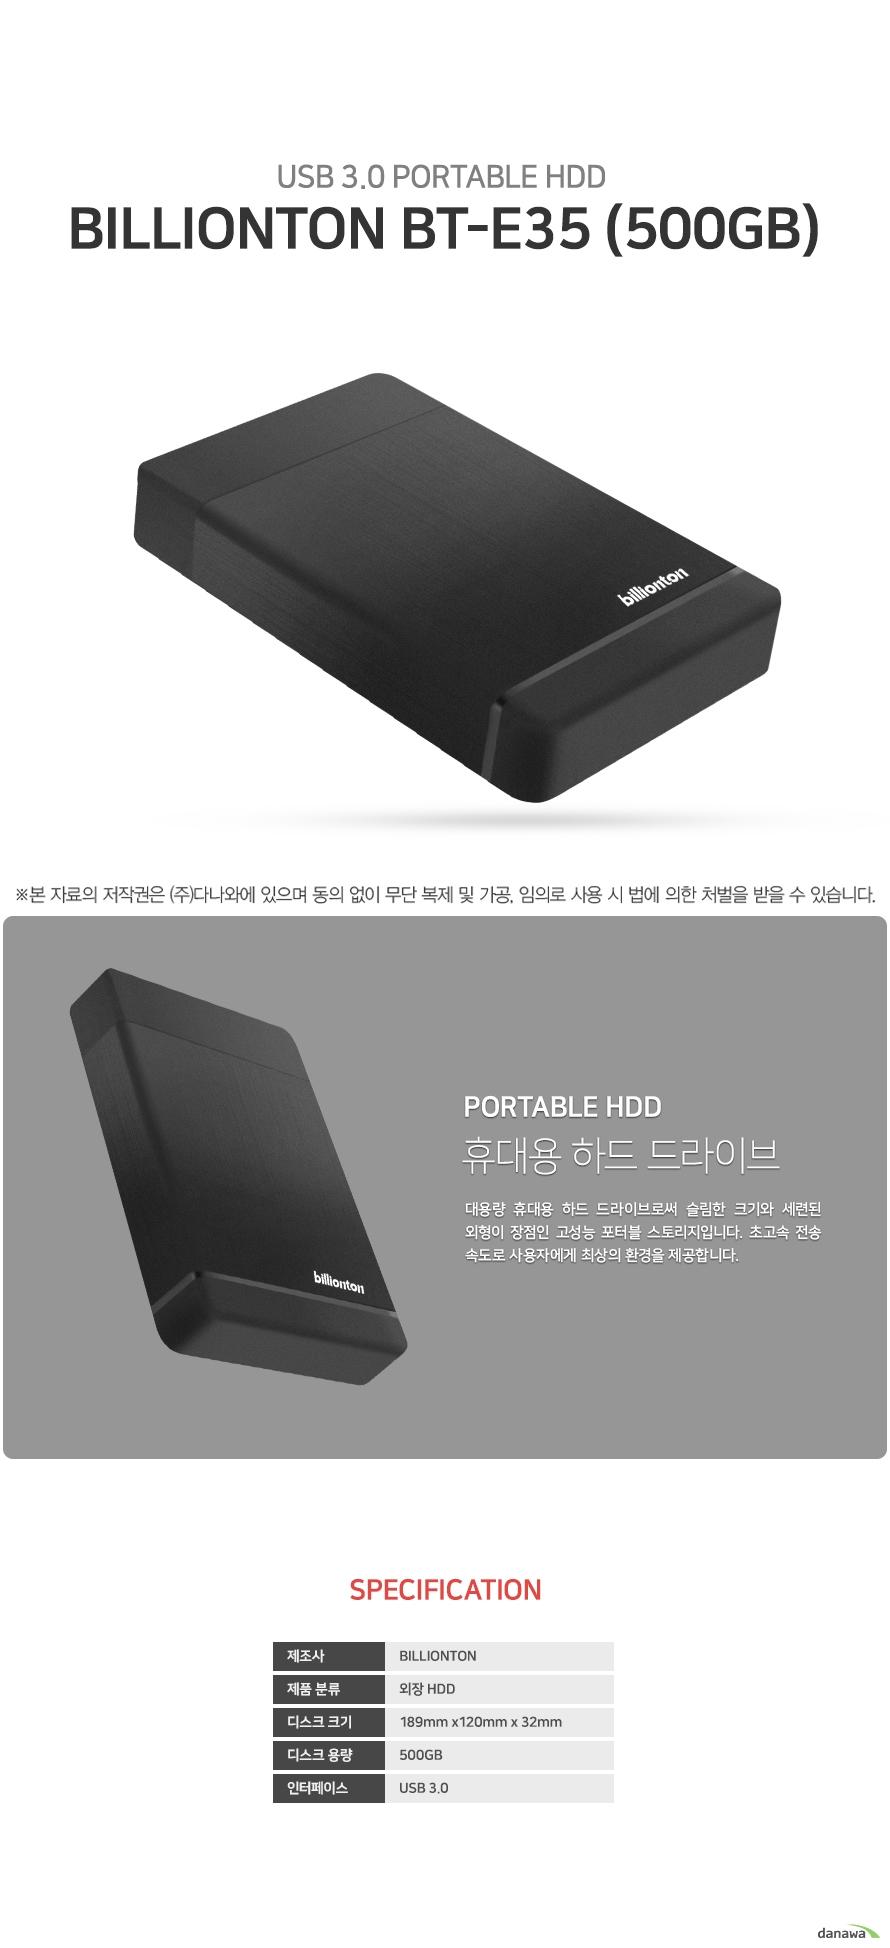 Billionton BT-E35 (500GB)  상세정보  제조사 billionton 제품 분류 외장 hdd 디스크 크기 길이 189 밀리미터              넓이 120 밀리미터             두께 32 밀리미터  디스크 용량 500기가바이트 인터페이스 usb 3.0